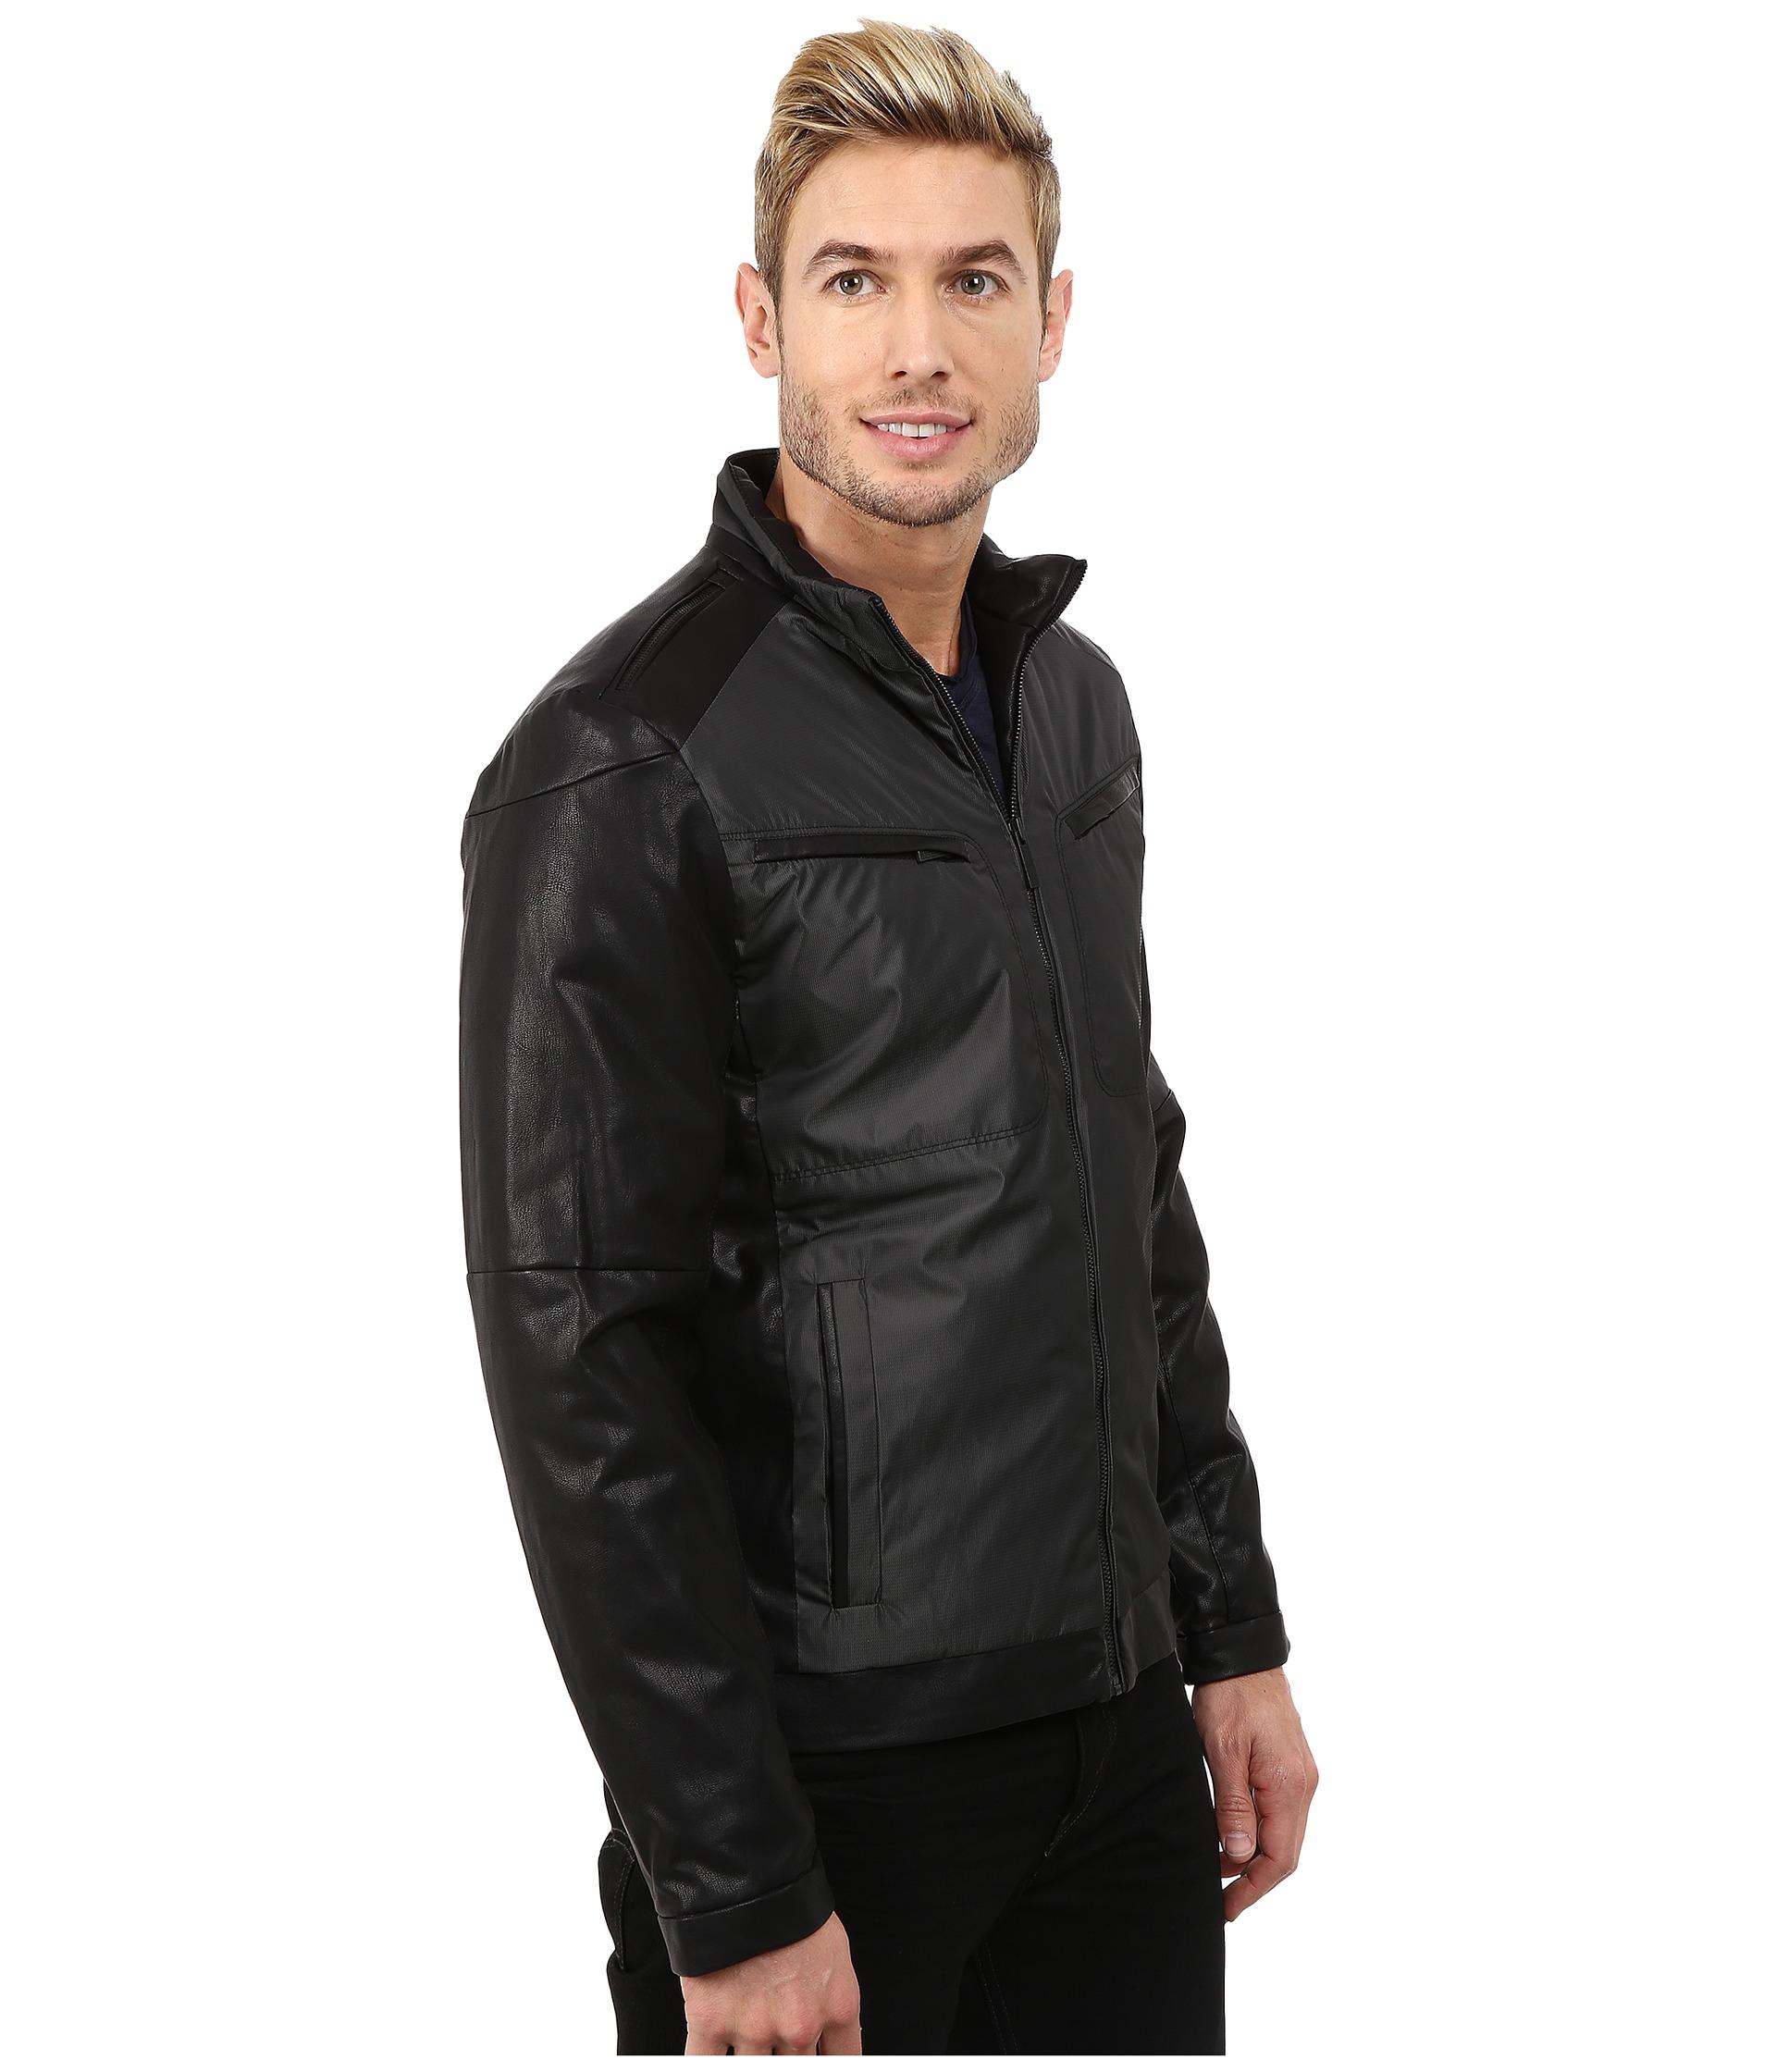 Yd leather jacket